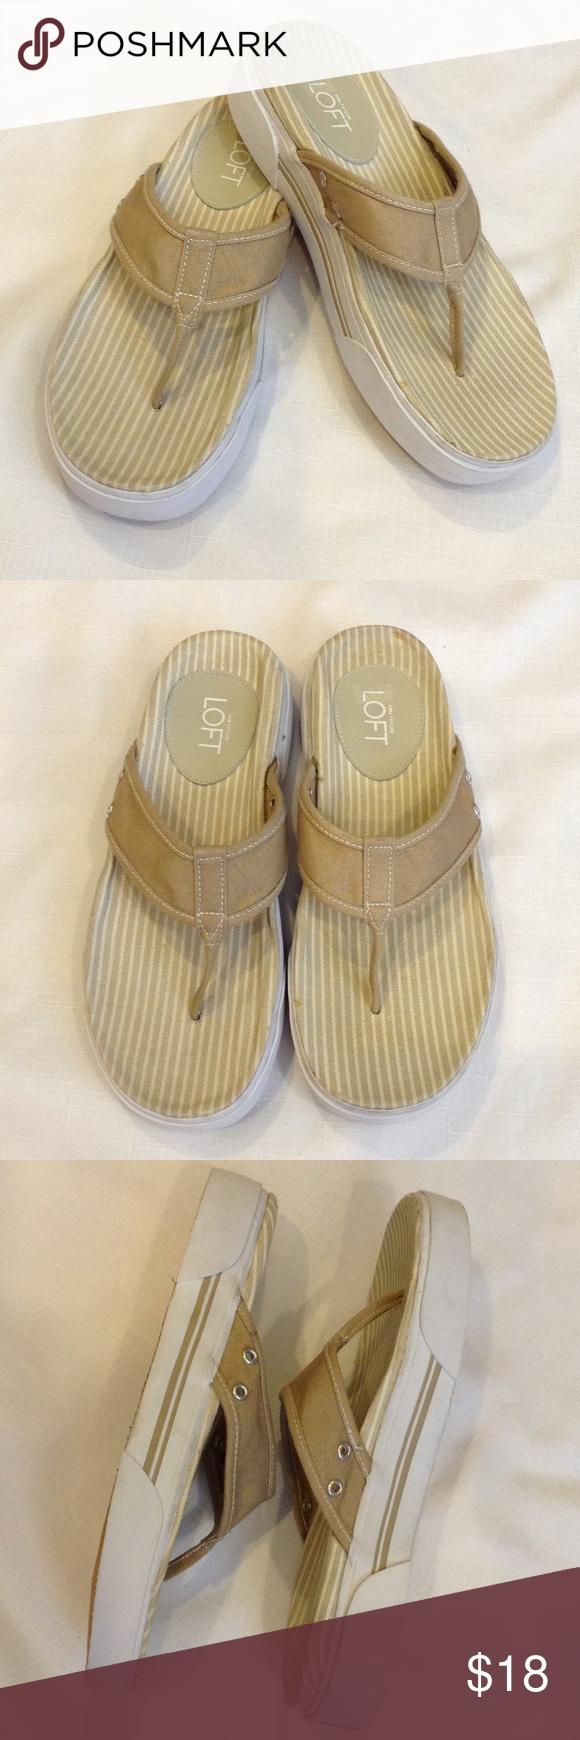 "🍭Sweet Deals🍭LOFT Canvass Flip Flop Sneaker Sole Excellent condition, beige canvass upper, stripped upper sole on 1.5"" sneaker sole. LOFT Shoes Sandals"